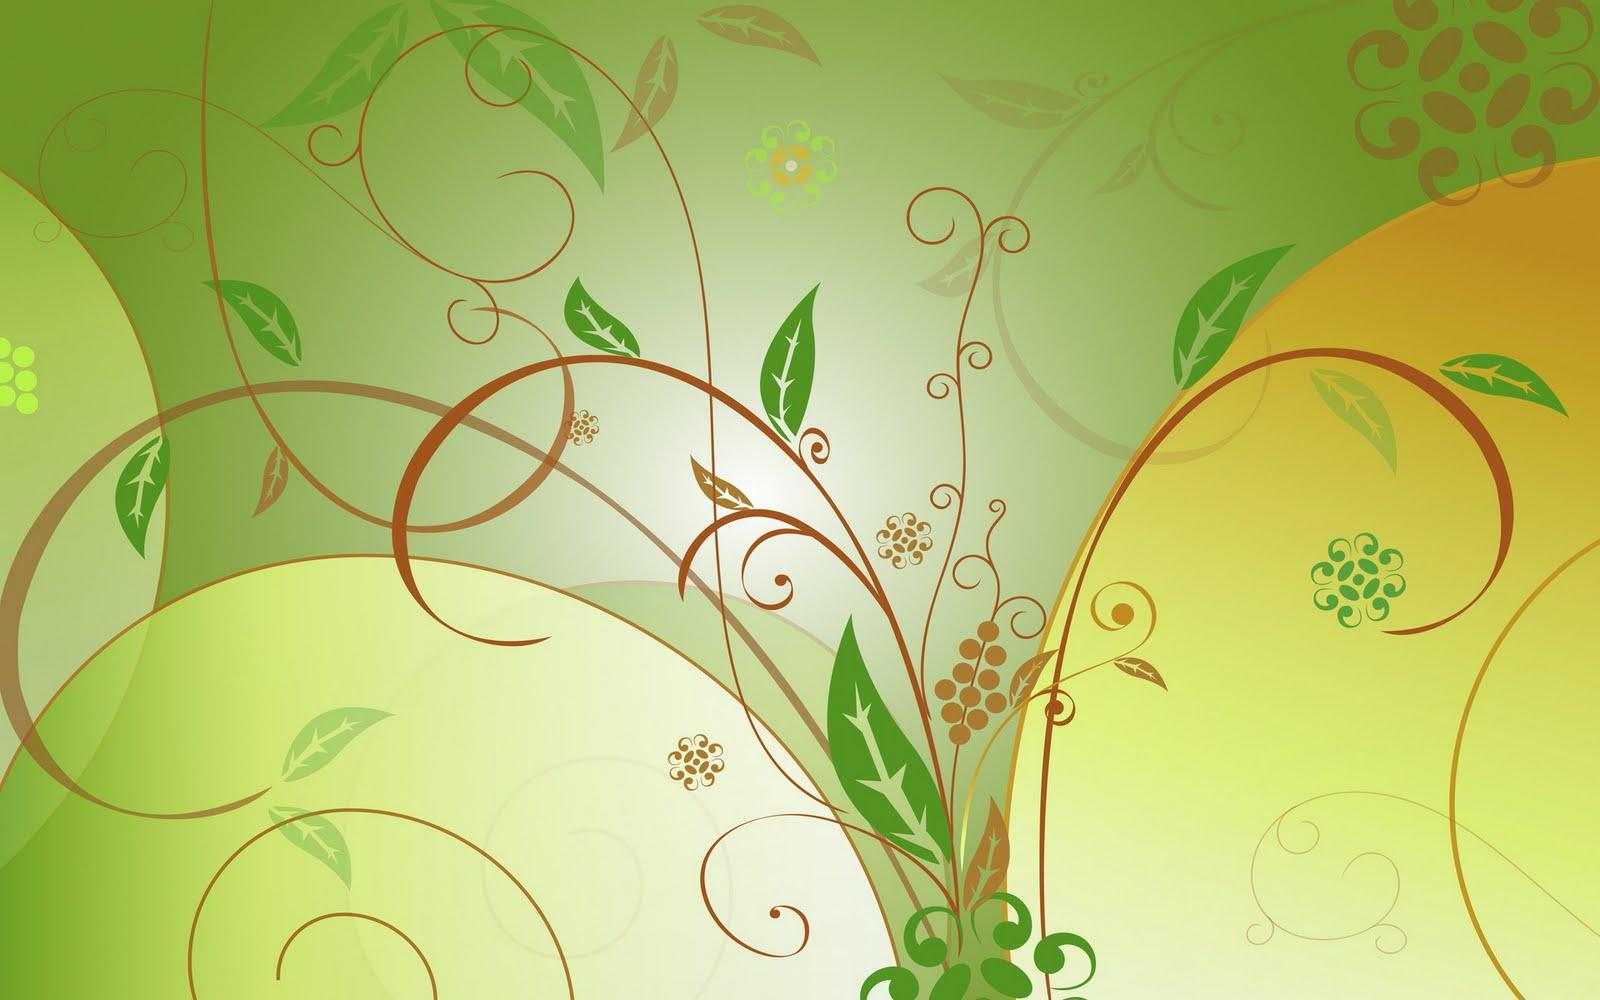 http://3.bp.blogspot.com/-KJiSNwMHQsY/ToJI4ypHLPI/AAAAAAAAly4/yJFoz6u3Wfs/s1600/01_floral-wallpapers.jpg